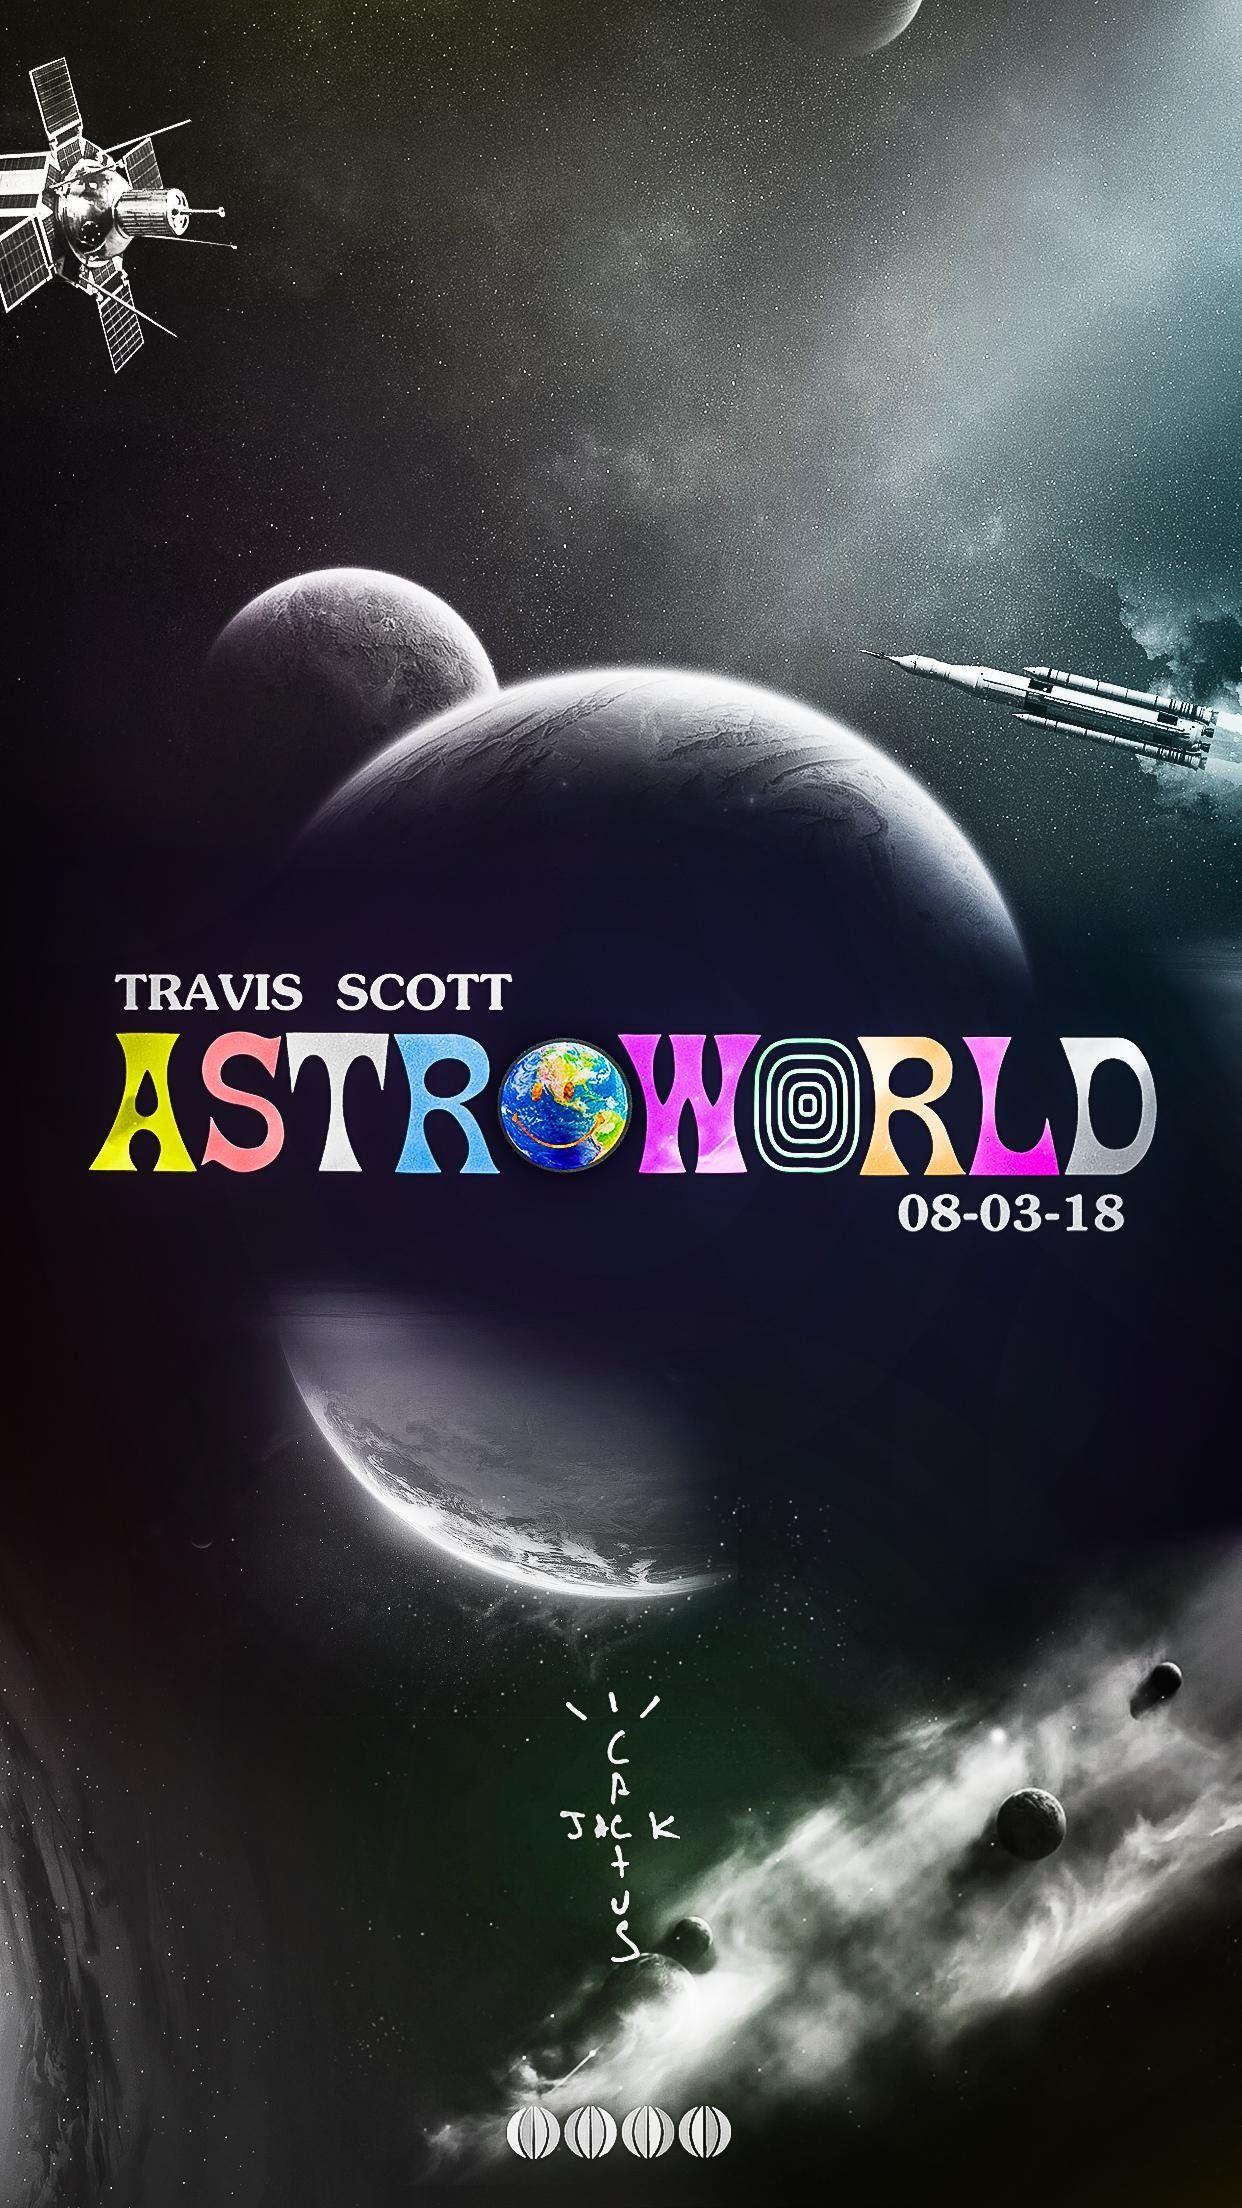 Astroworld Wallpaper 2 In 2020 Travis Scott Iphone Wallpaper Travis Scott Wallpapers Chill Wallpaper